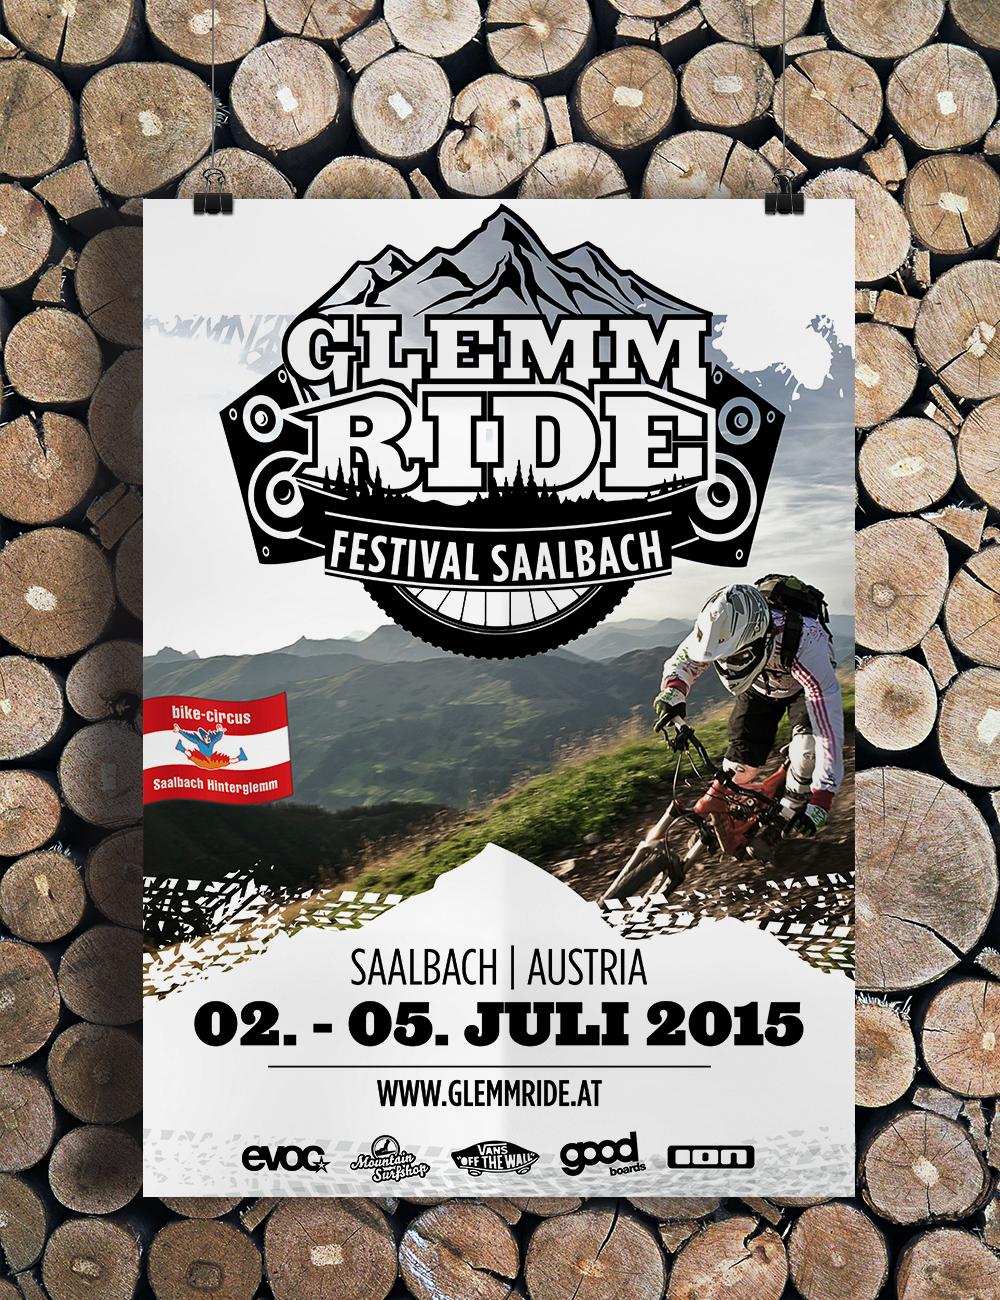 BLACKBIRD Ind. Bochum - Glemmride Festival Saalbach